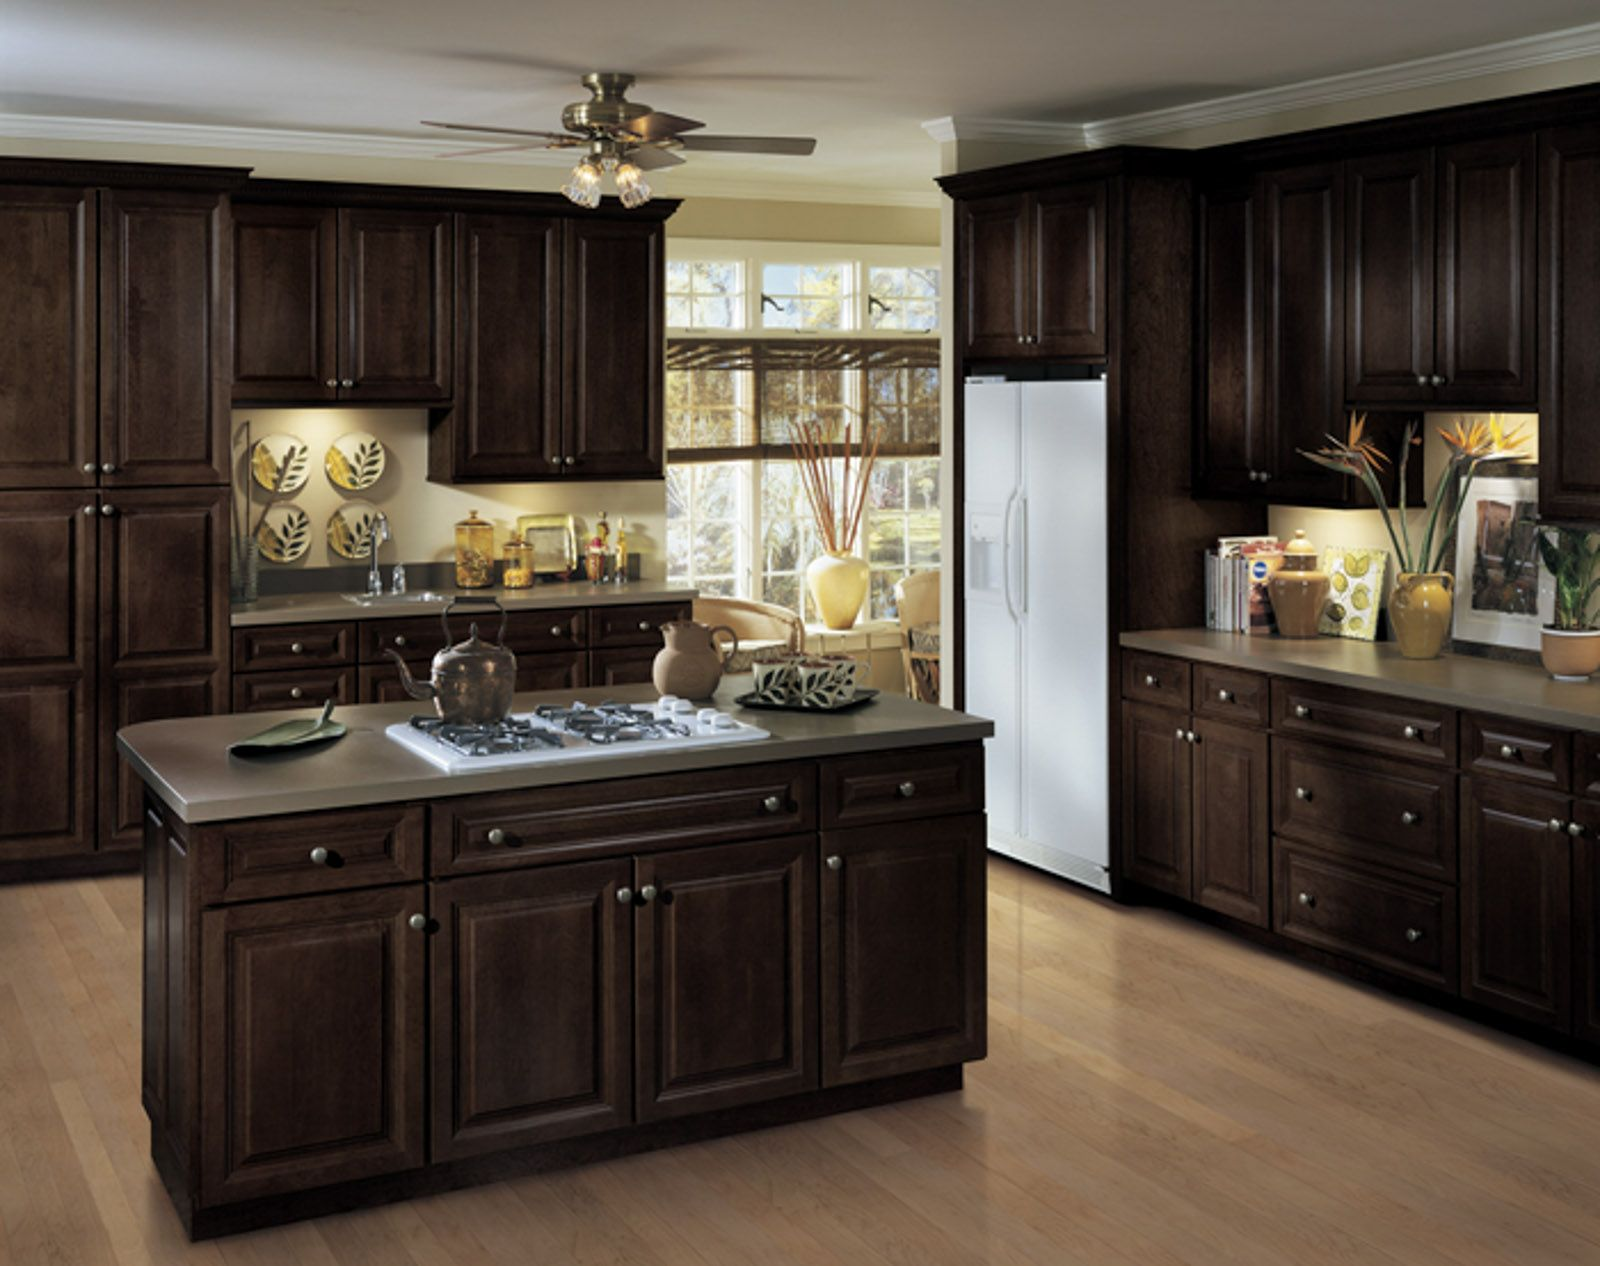 buy modern kitchen cabinets online countertop laminate echelon cabinetry langdon 5pc espresso home pinterest